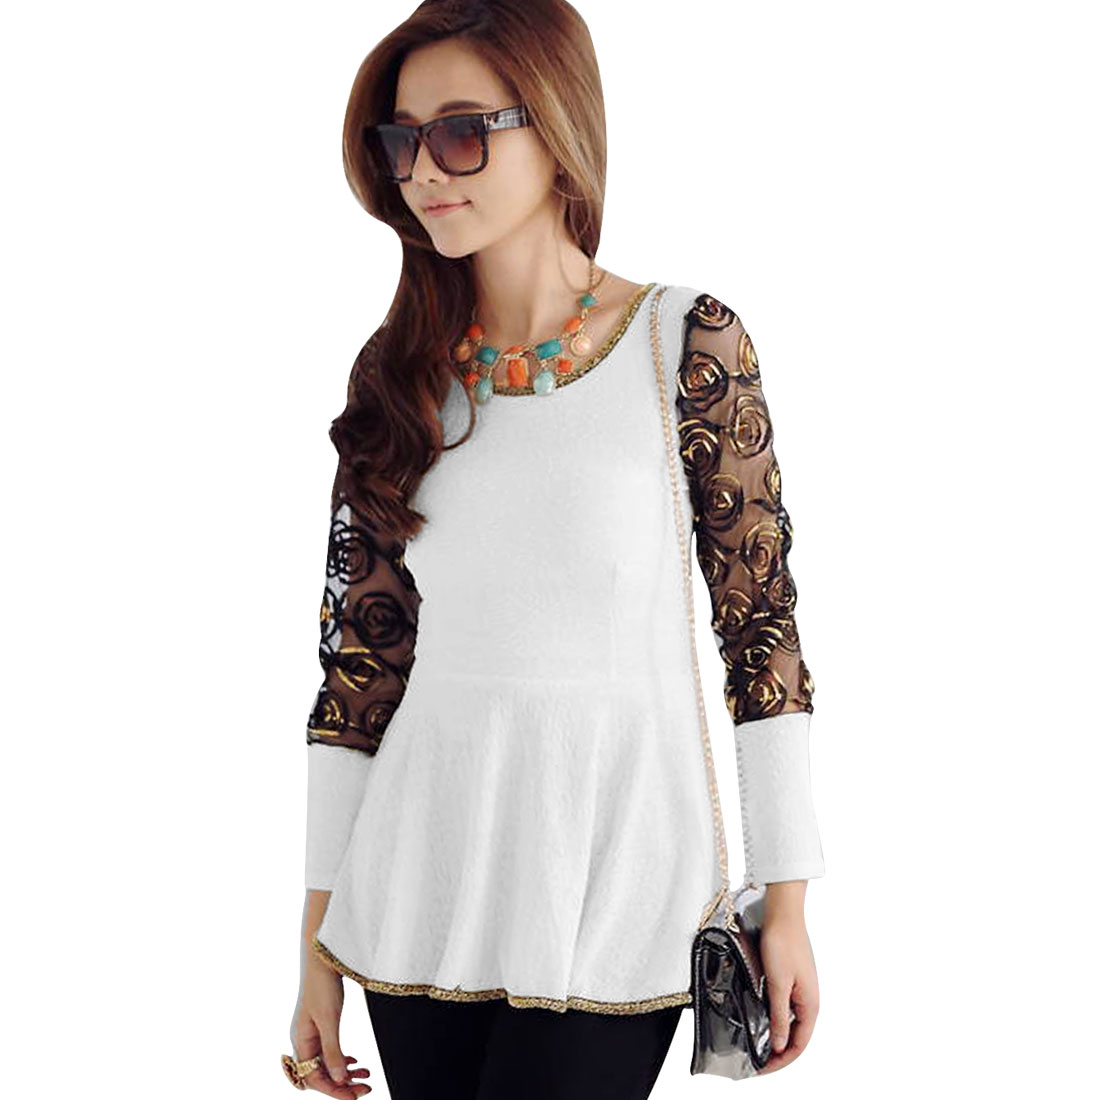 Ladies Mesh Sleeve Patchwork Peplum Top White XS